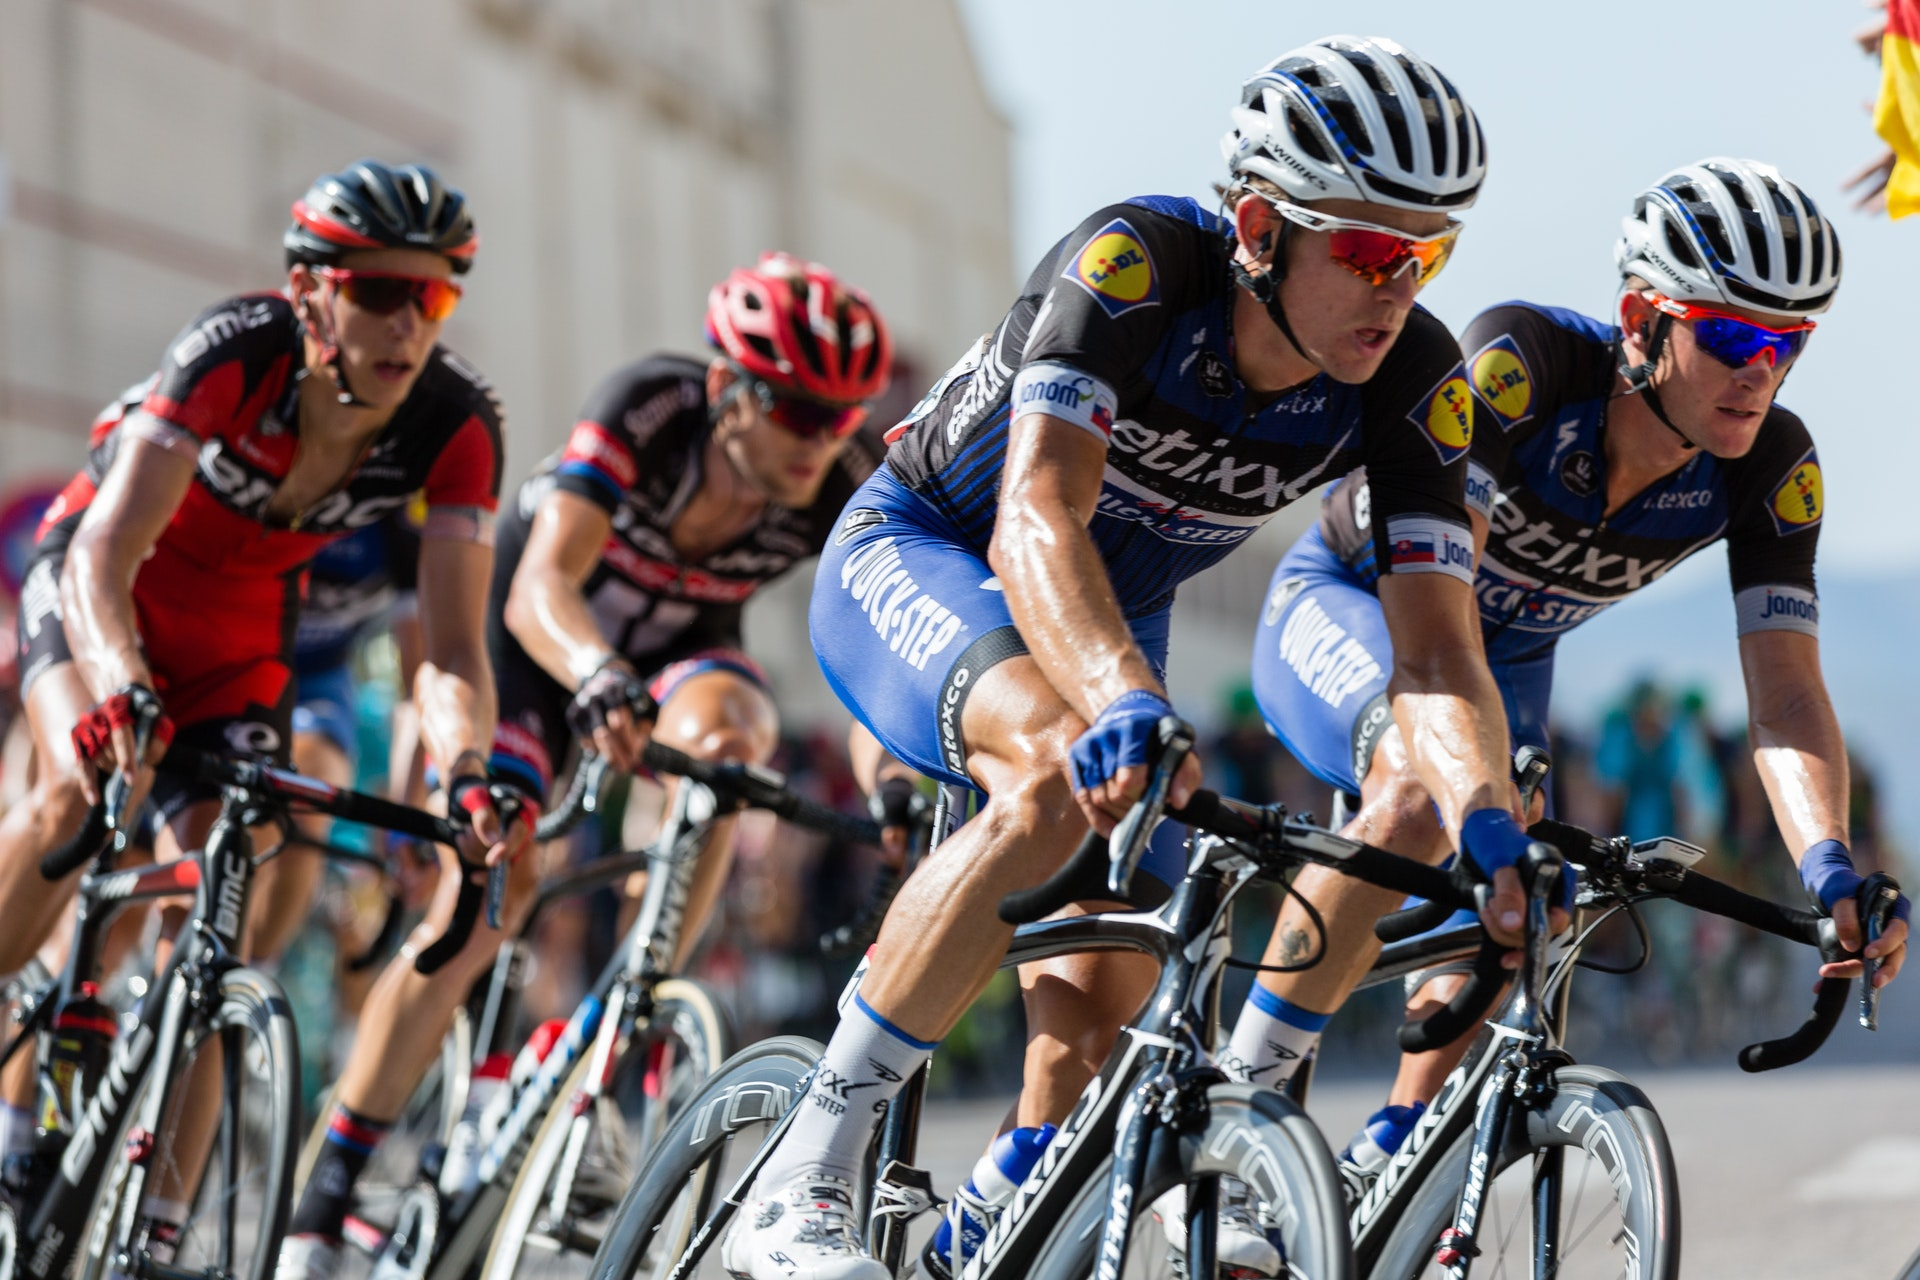 tour de france, cykle, frankrig, danmark, sport, cykelløb, cykel